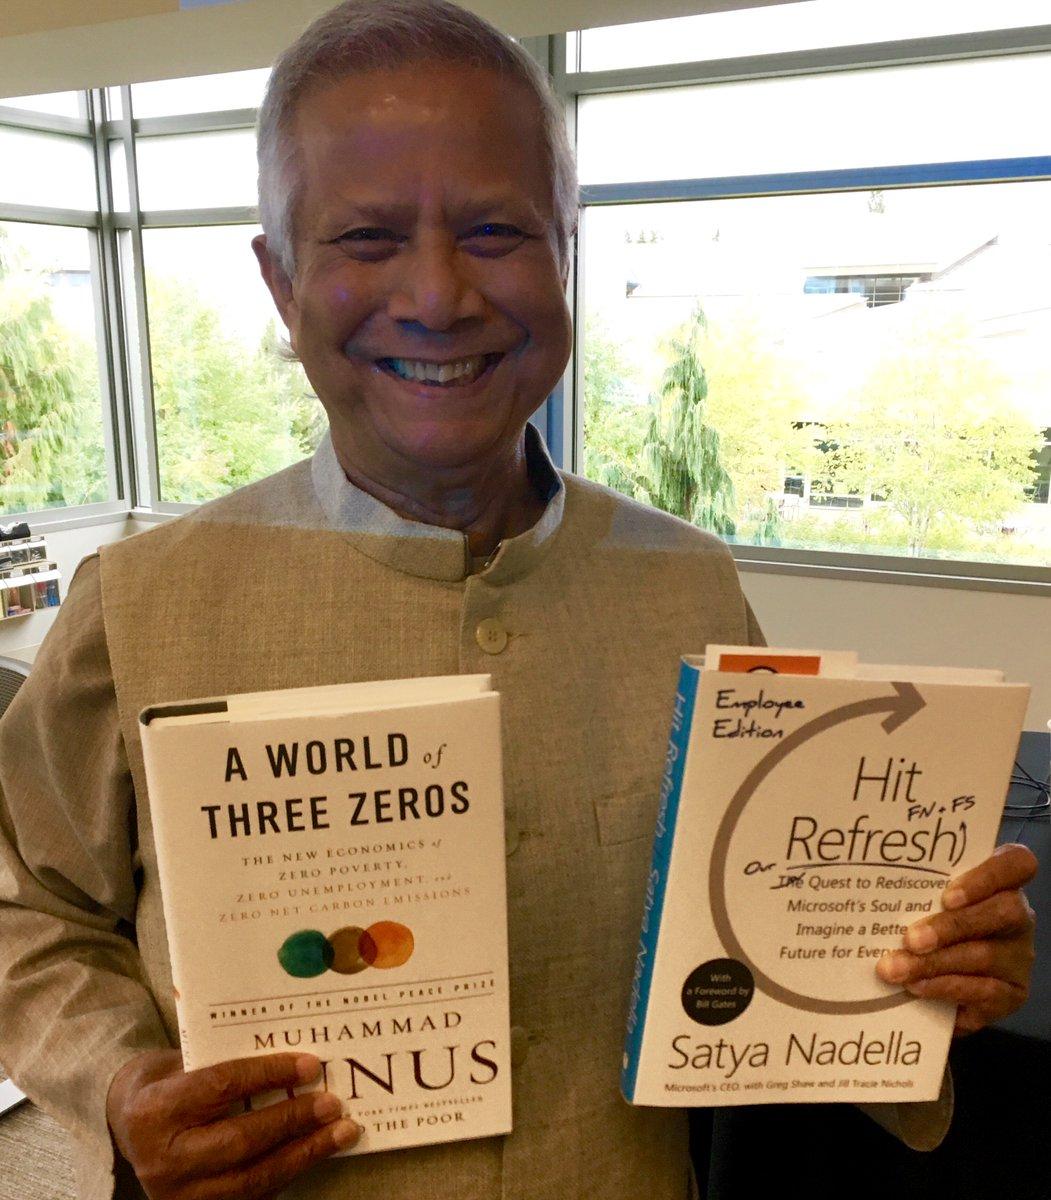 Microcredit&#39;s Yunus @ Microsoft. Celebrating culture of giving @Akhtarbad @msphilanthropic #msftalum #hitrefresh #empathy #WorldOfThreeZeros<br>http://pic.twitter.com/bHi0oHJCht